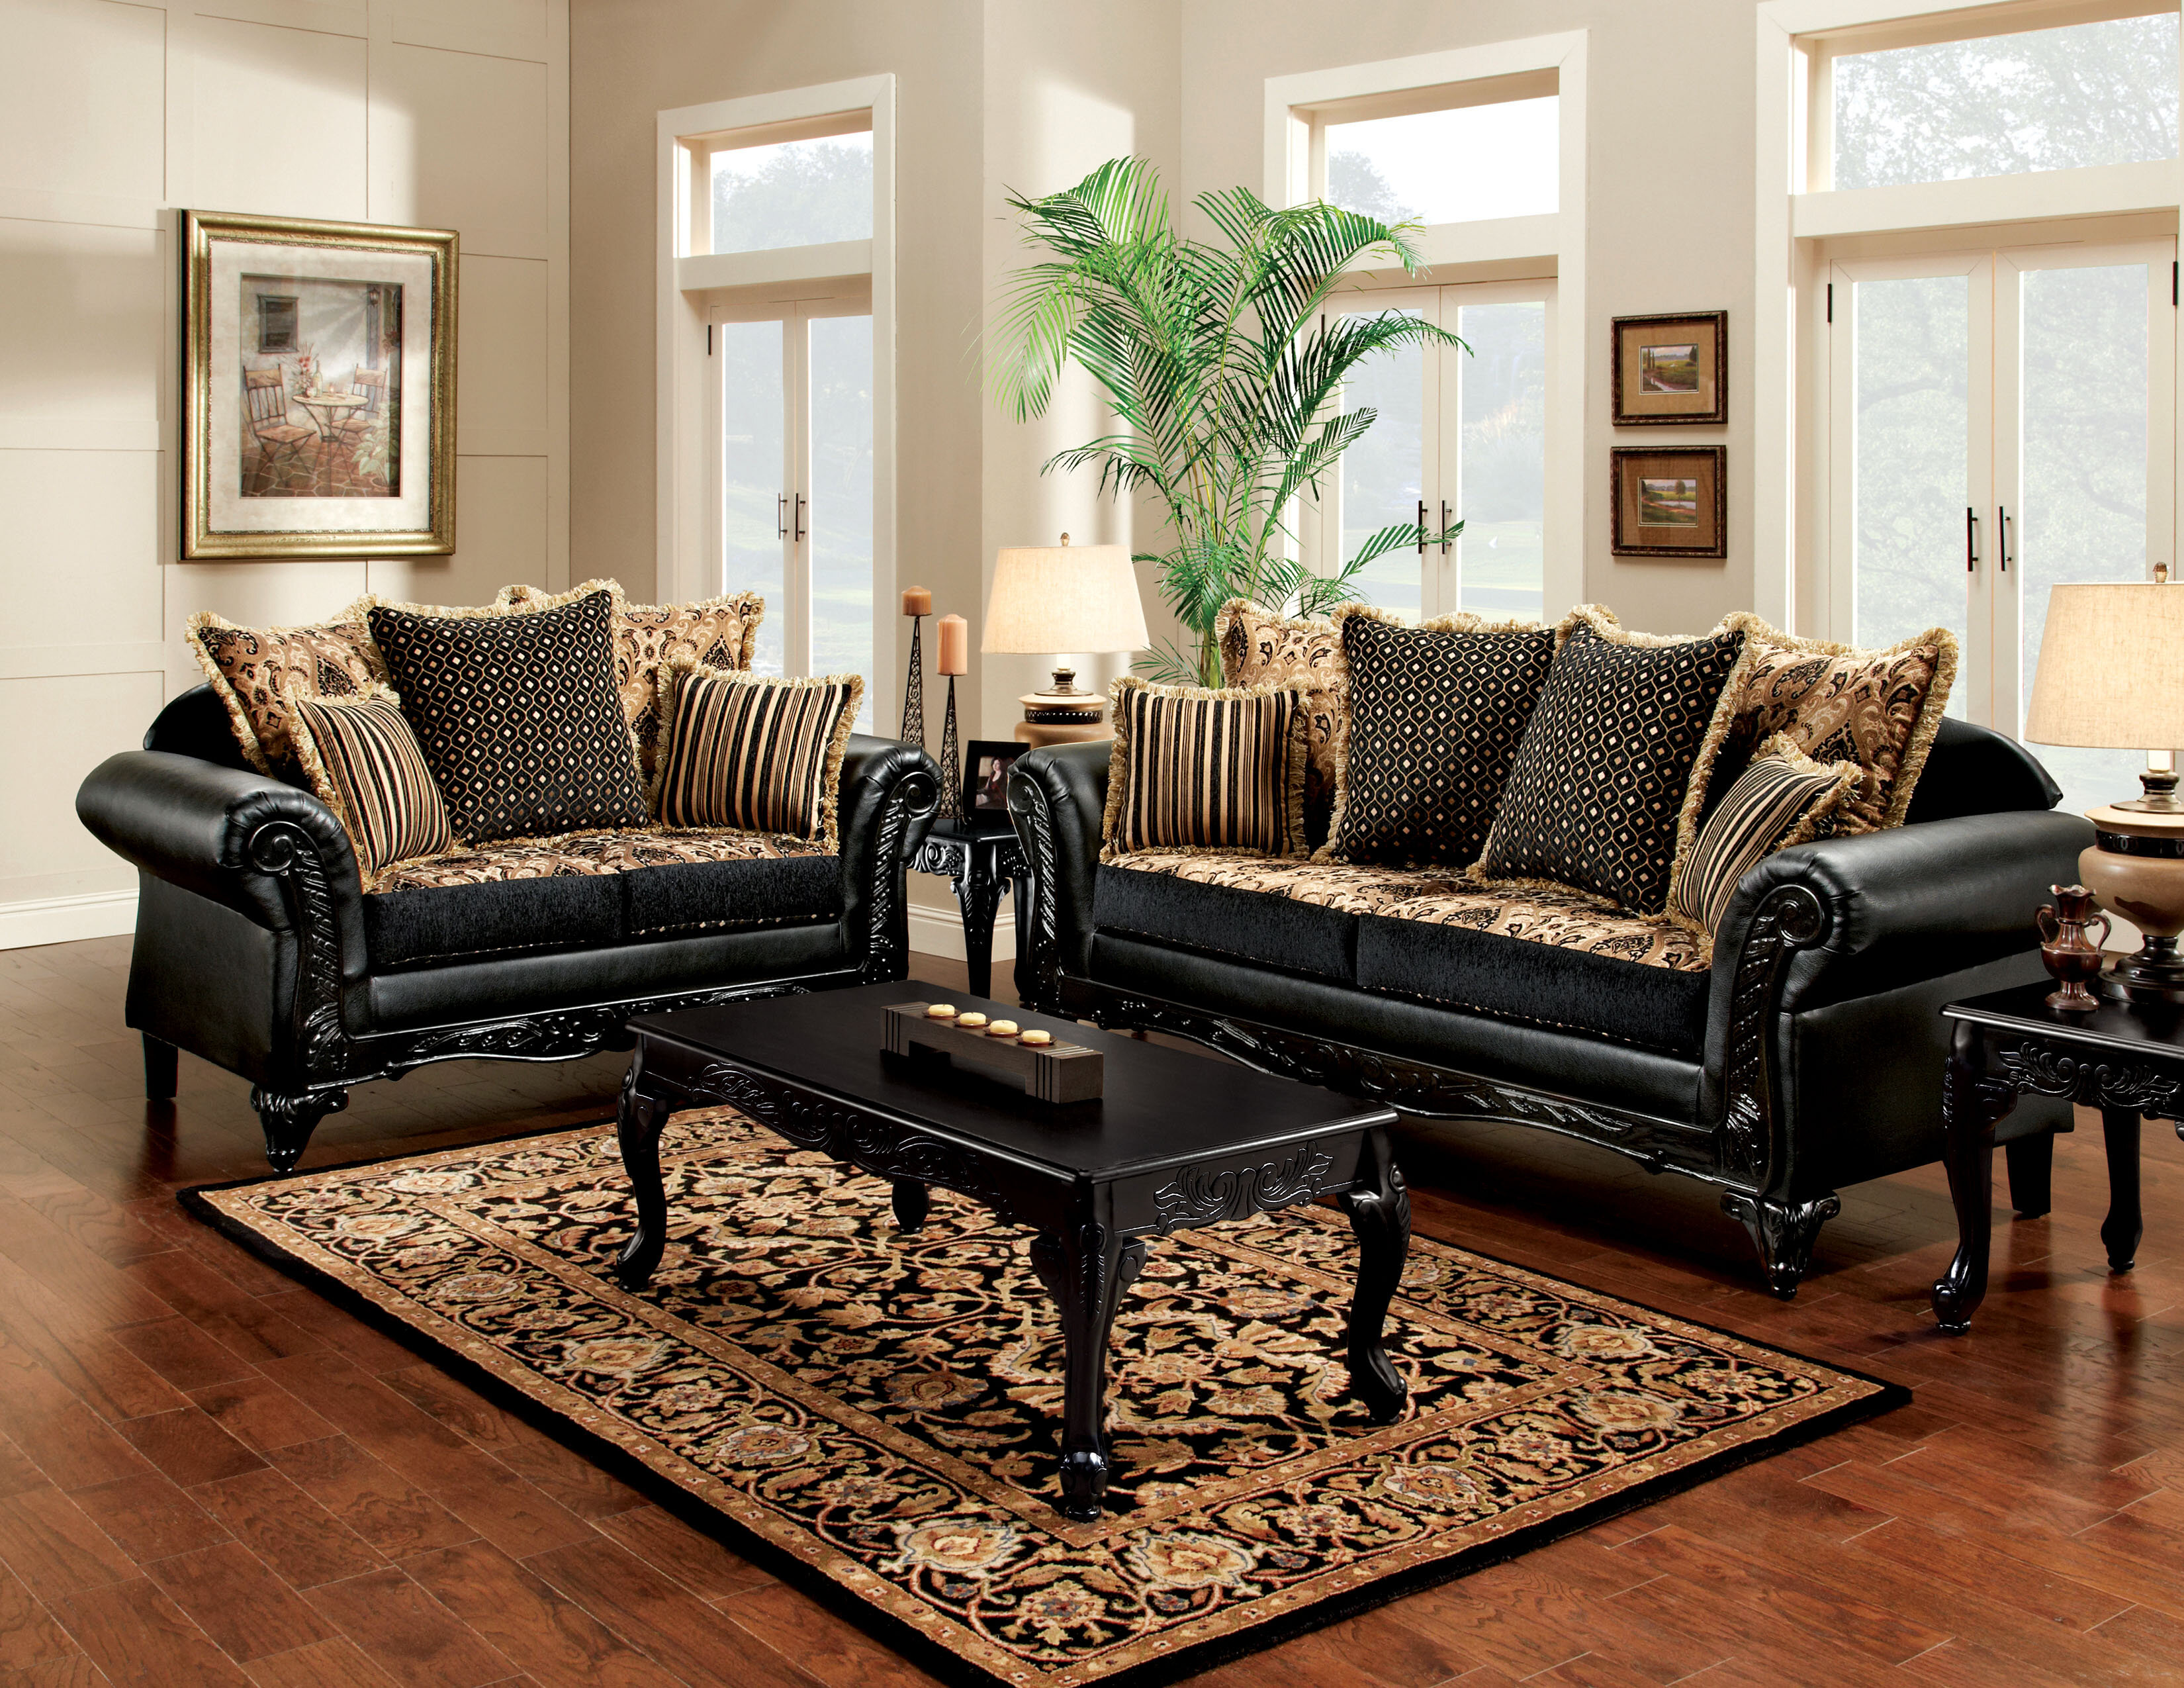 Astoria grand doonans configurable living room set reviews wayfair